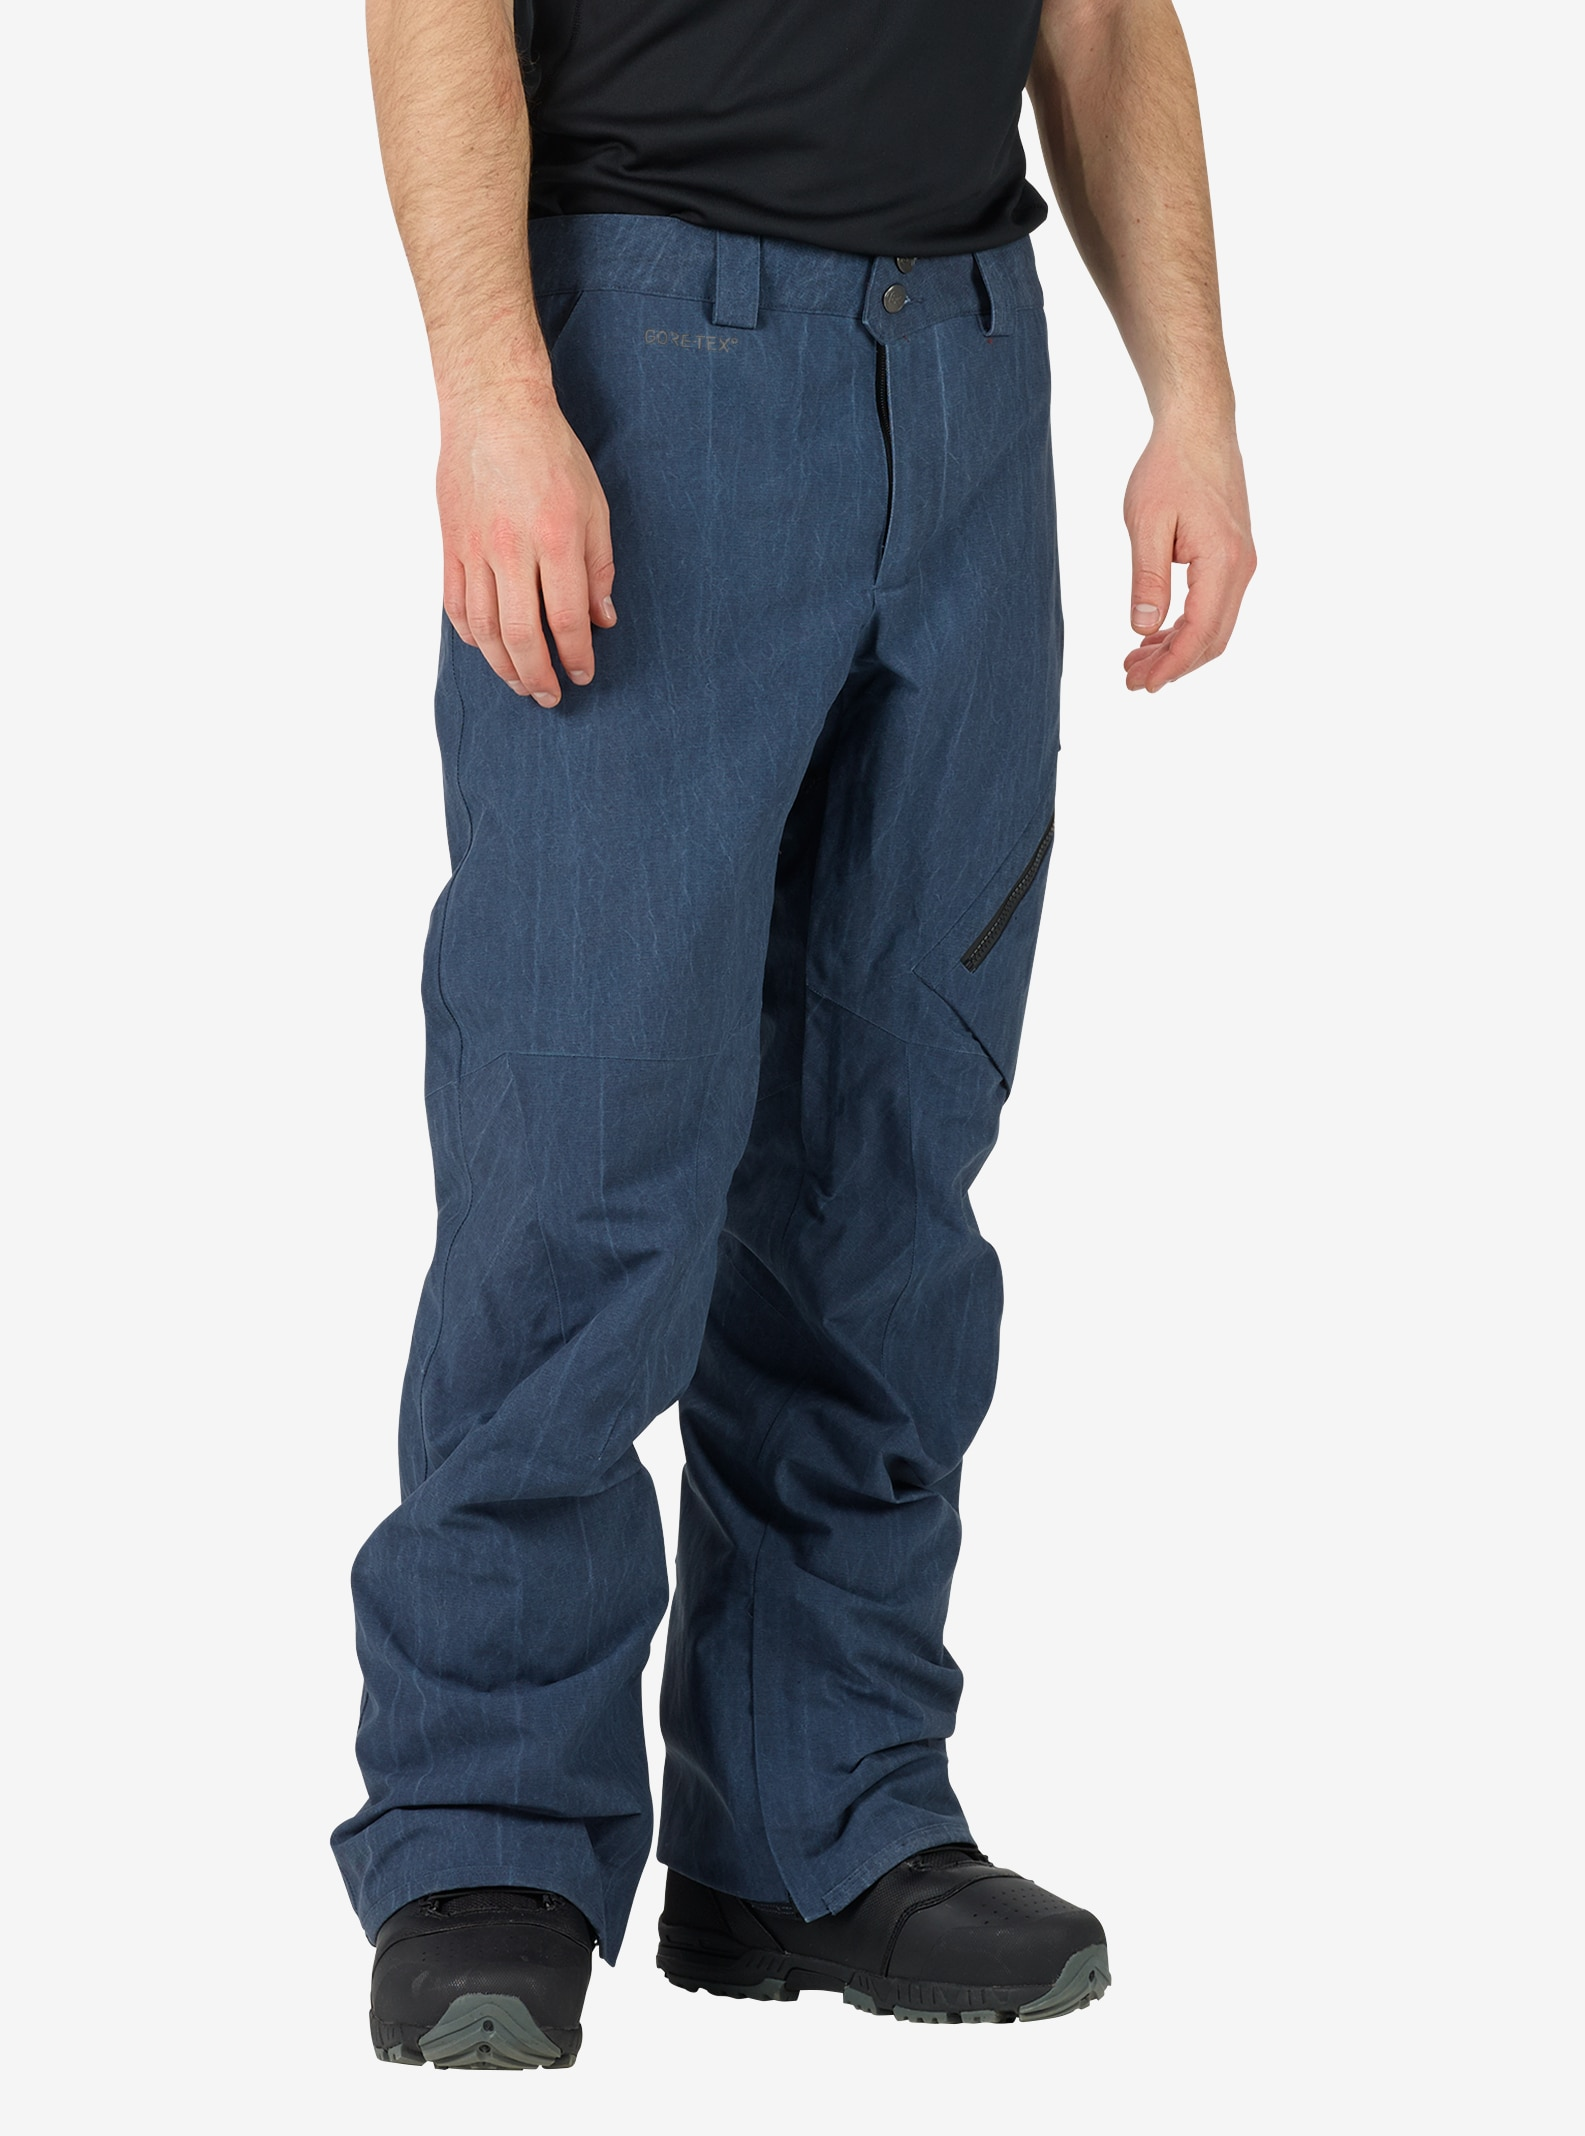 Men's Burton [ak] GORE‑TEX® 2L Cyclic Pant shown in Mood Indigo Vintage Wash